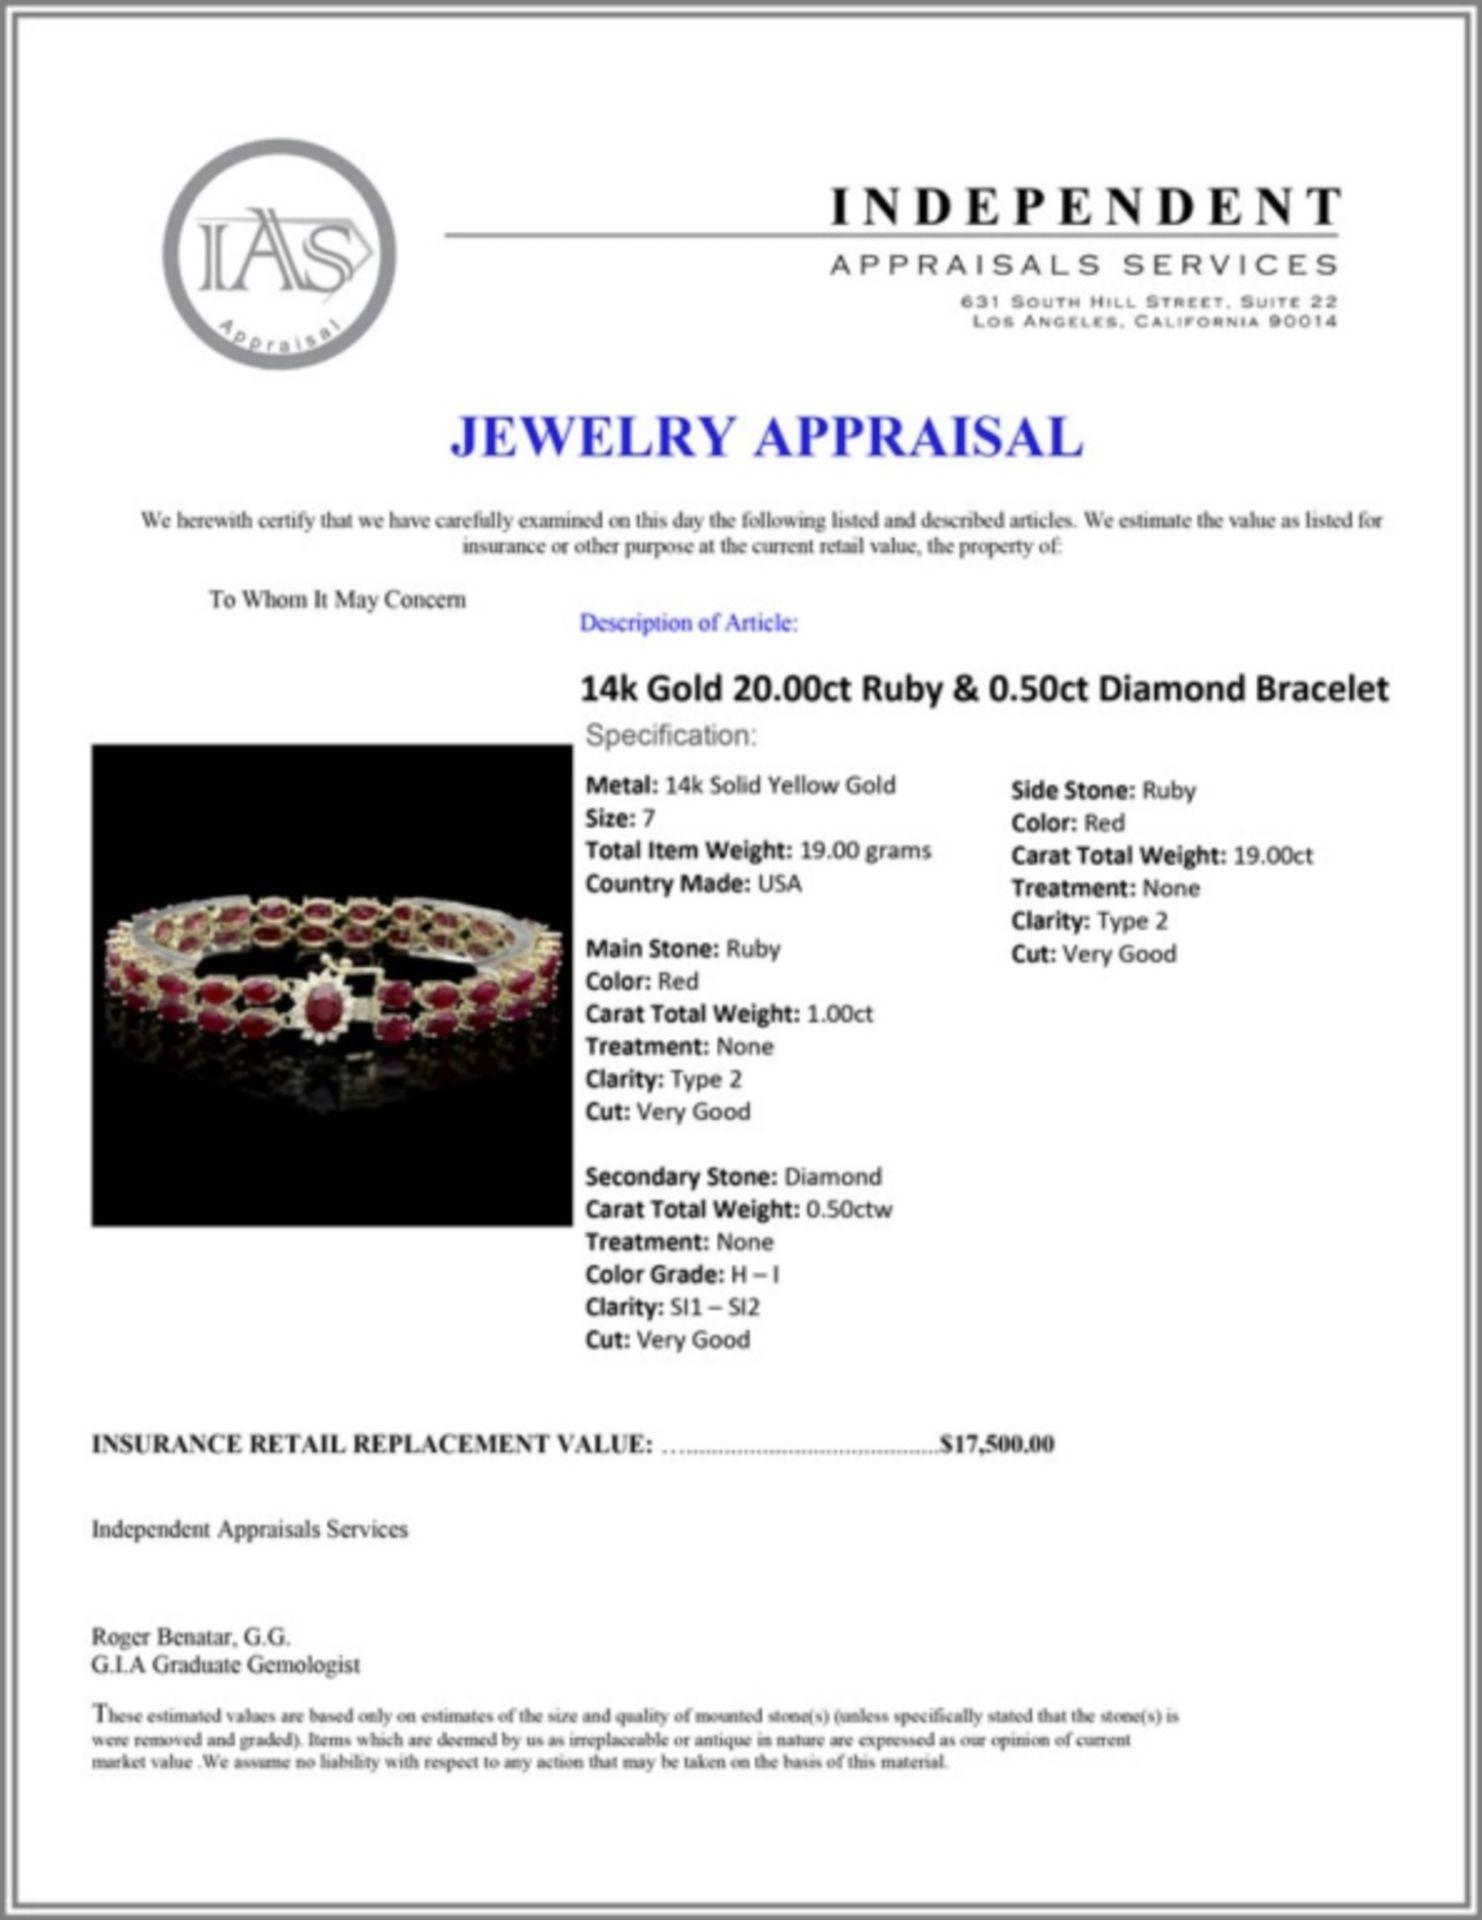 `14k Gold 20.00ct Ruby & 0.50ct Diamond Bracelet - Image 3 of 3